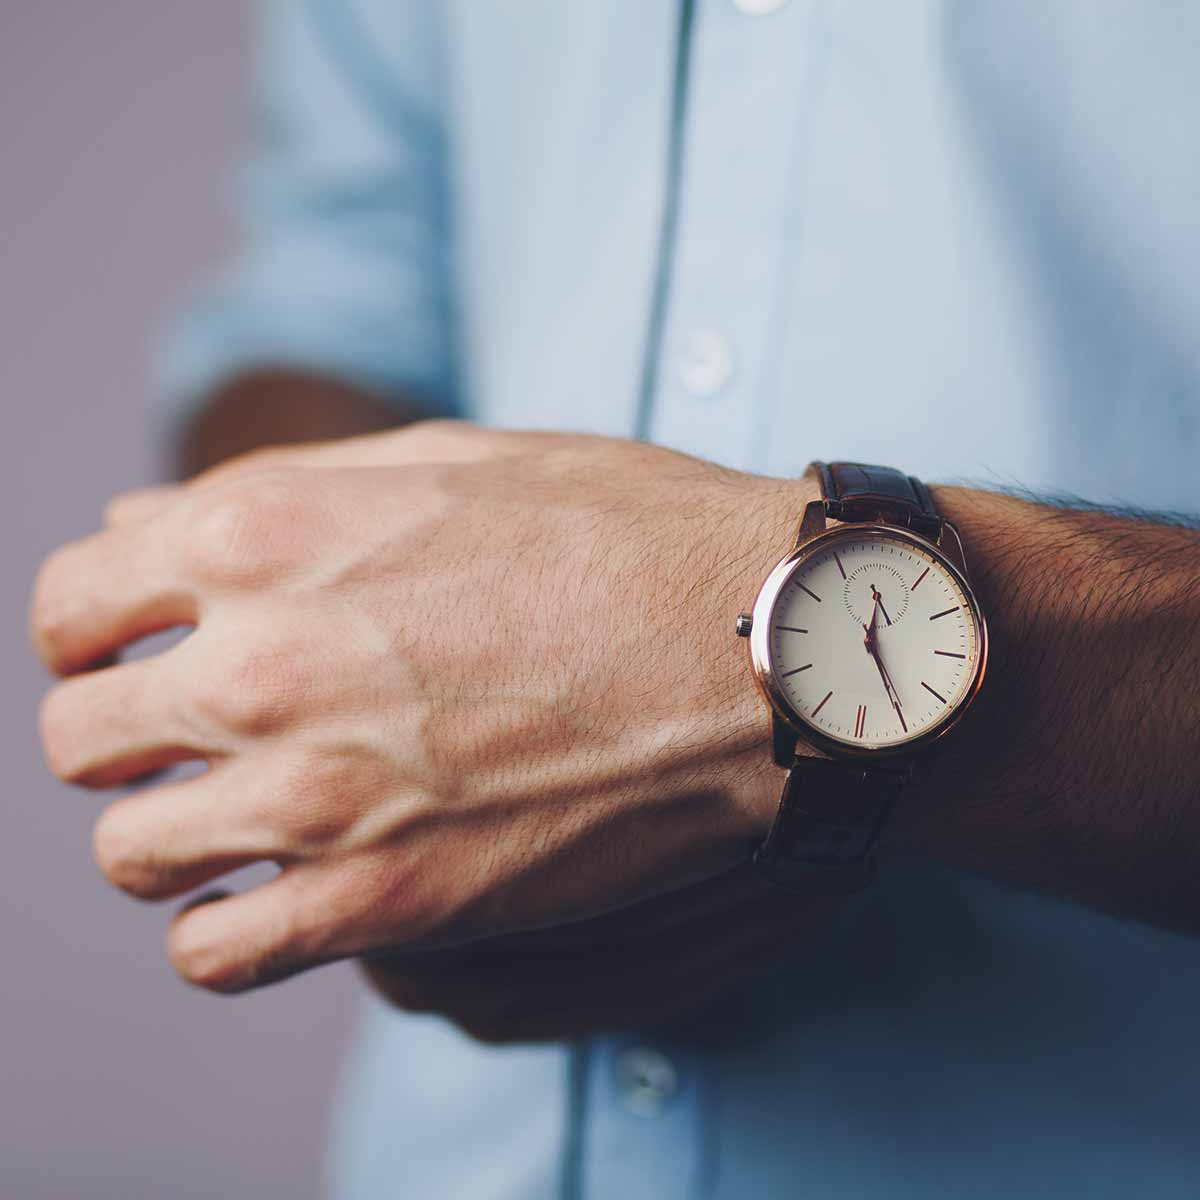 orologio-uomo_gioiellerilaforgia